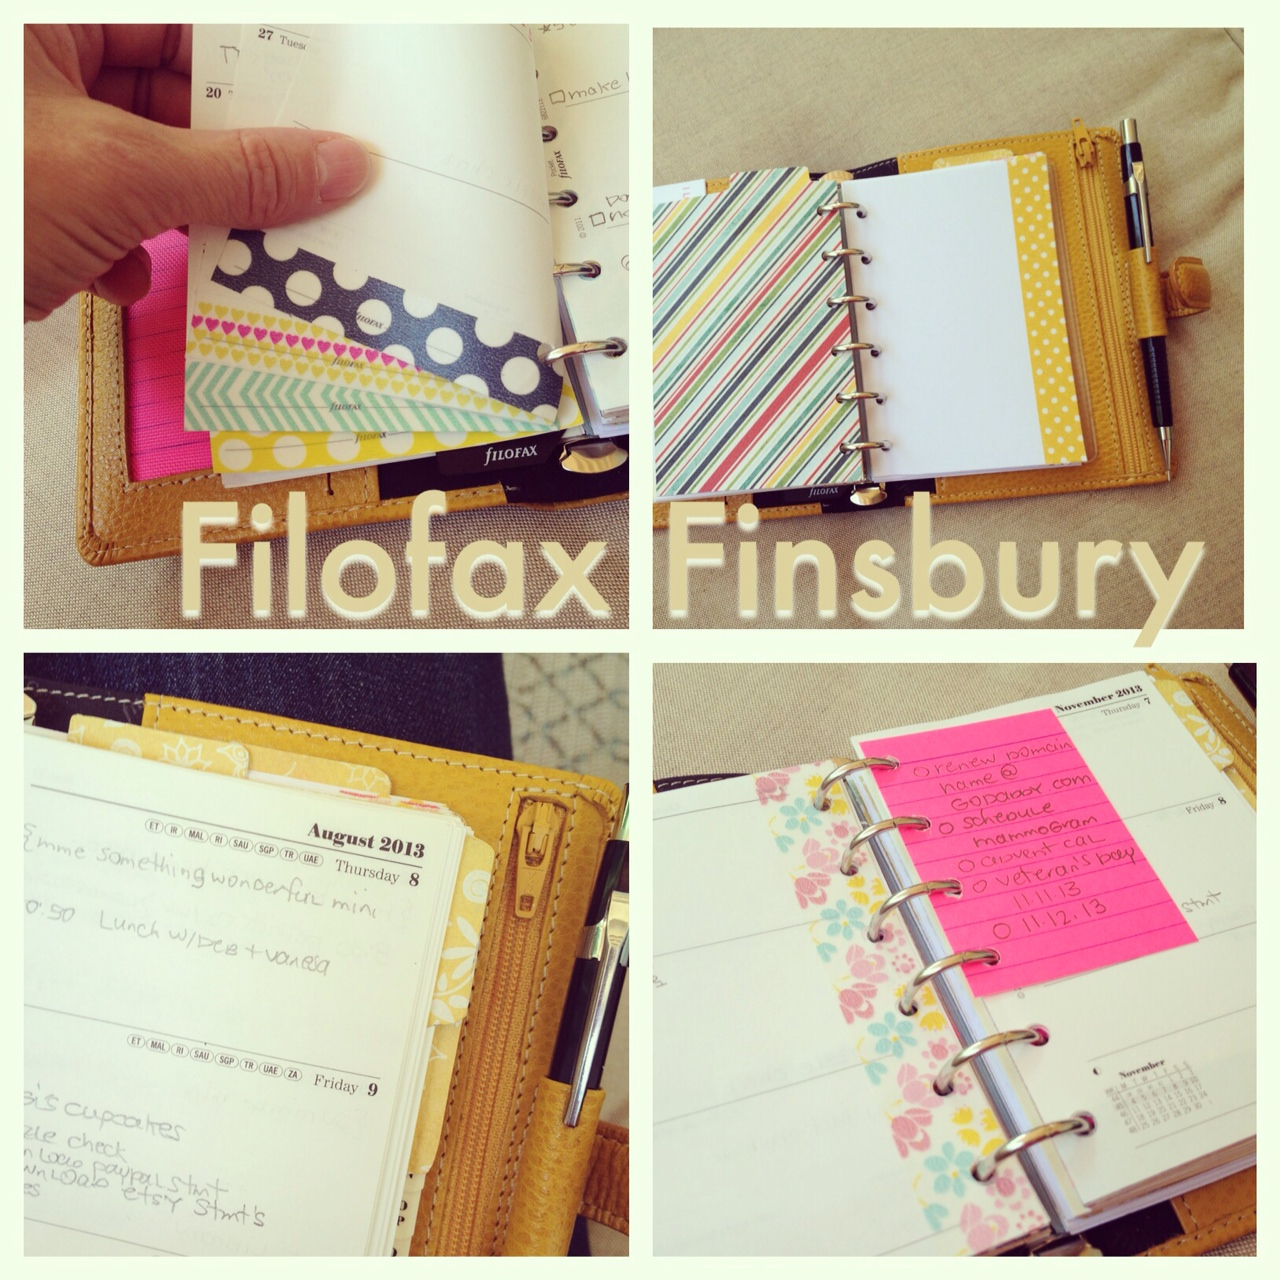 Filofax Pocket Finsbury | iloveitallwithmonikawright.com